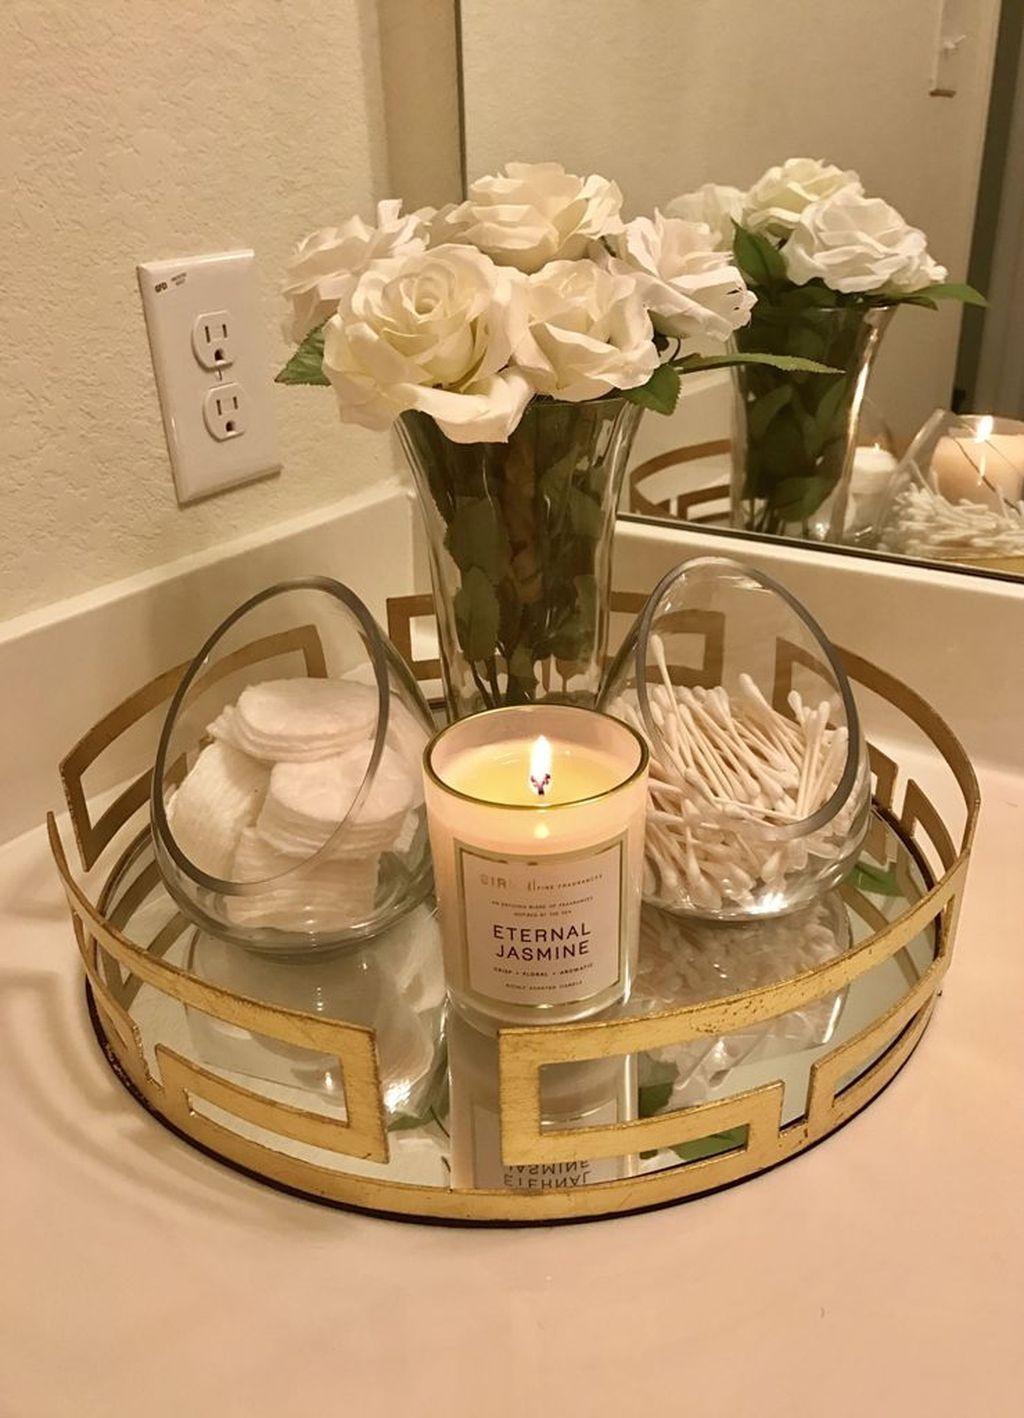 48 Fantastic Bathroom Countertop Ideas Look Elegant #kitchendecor